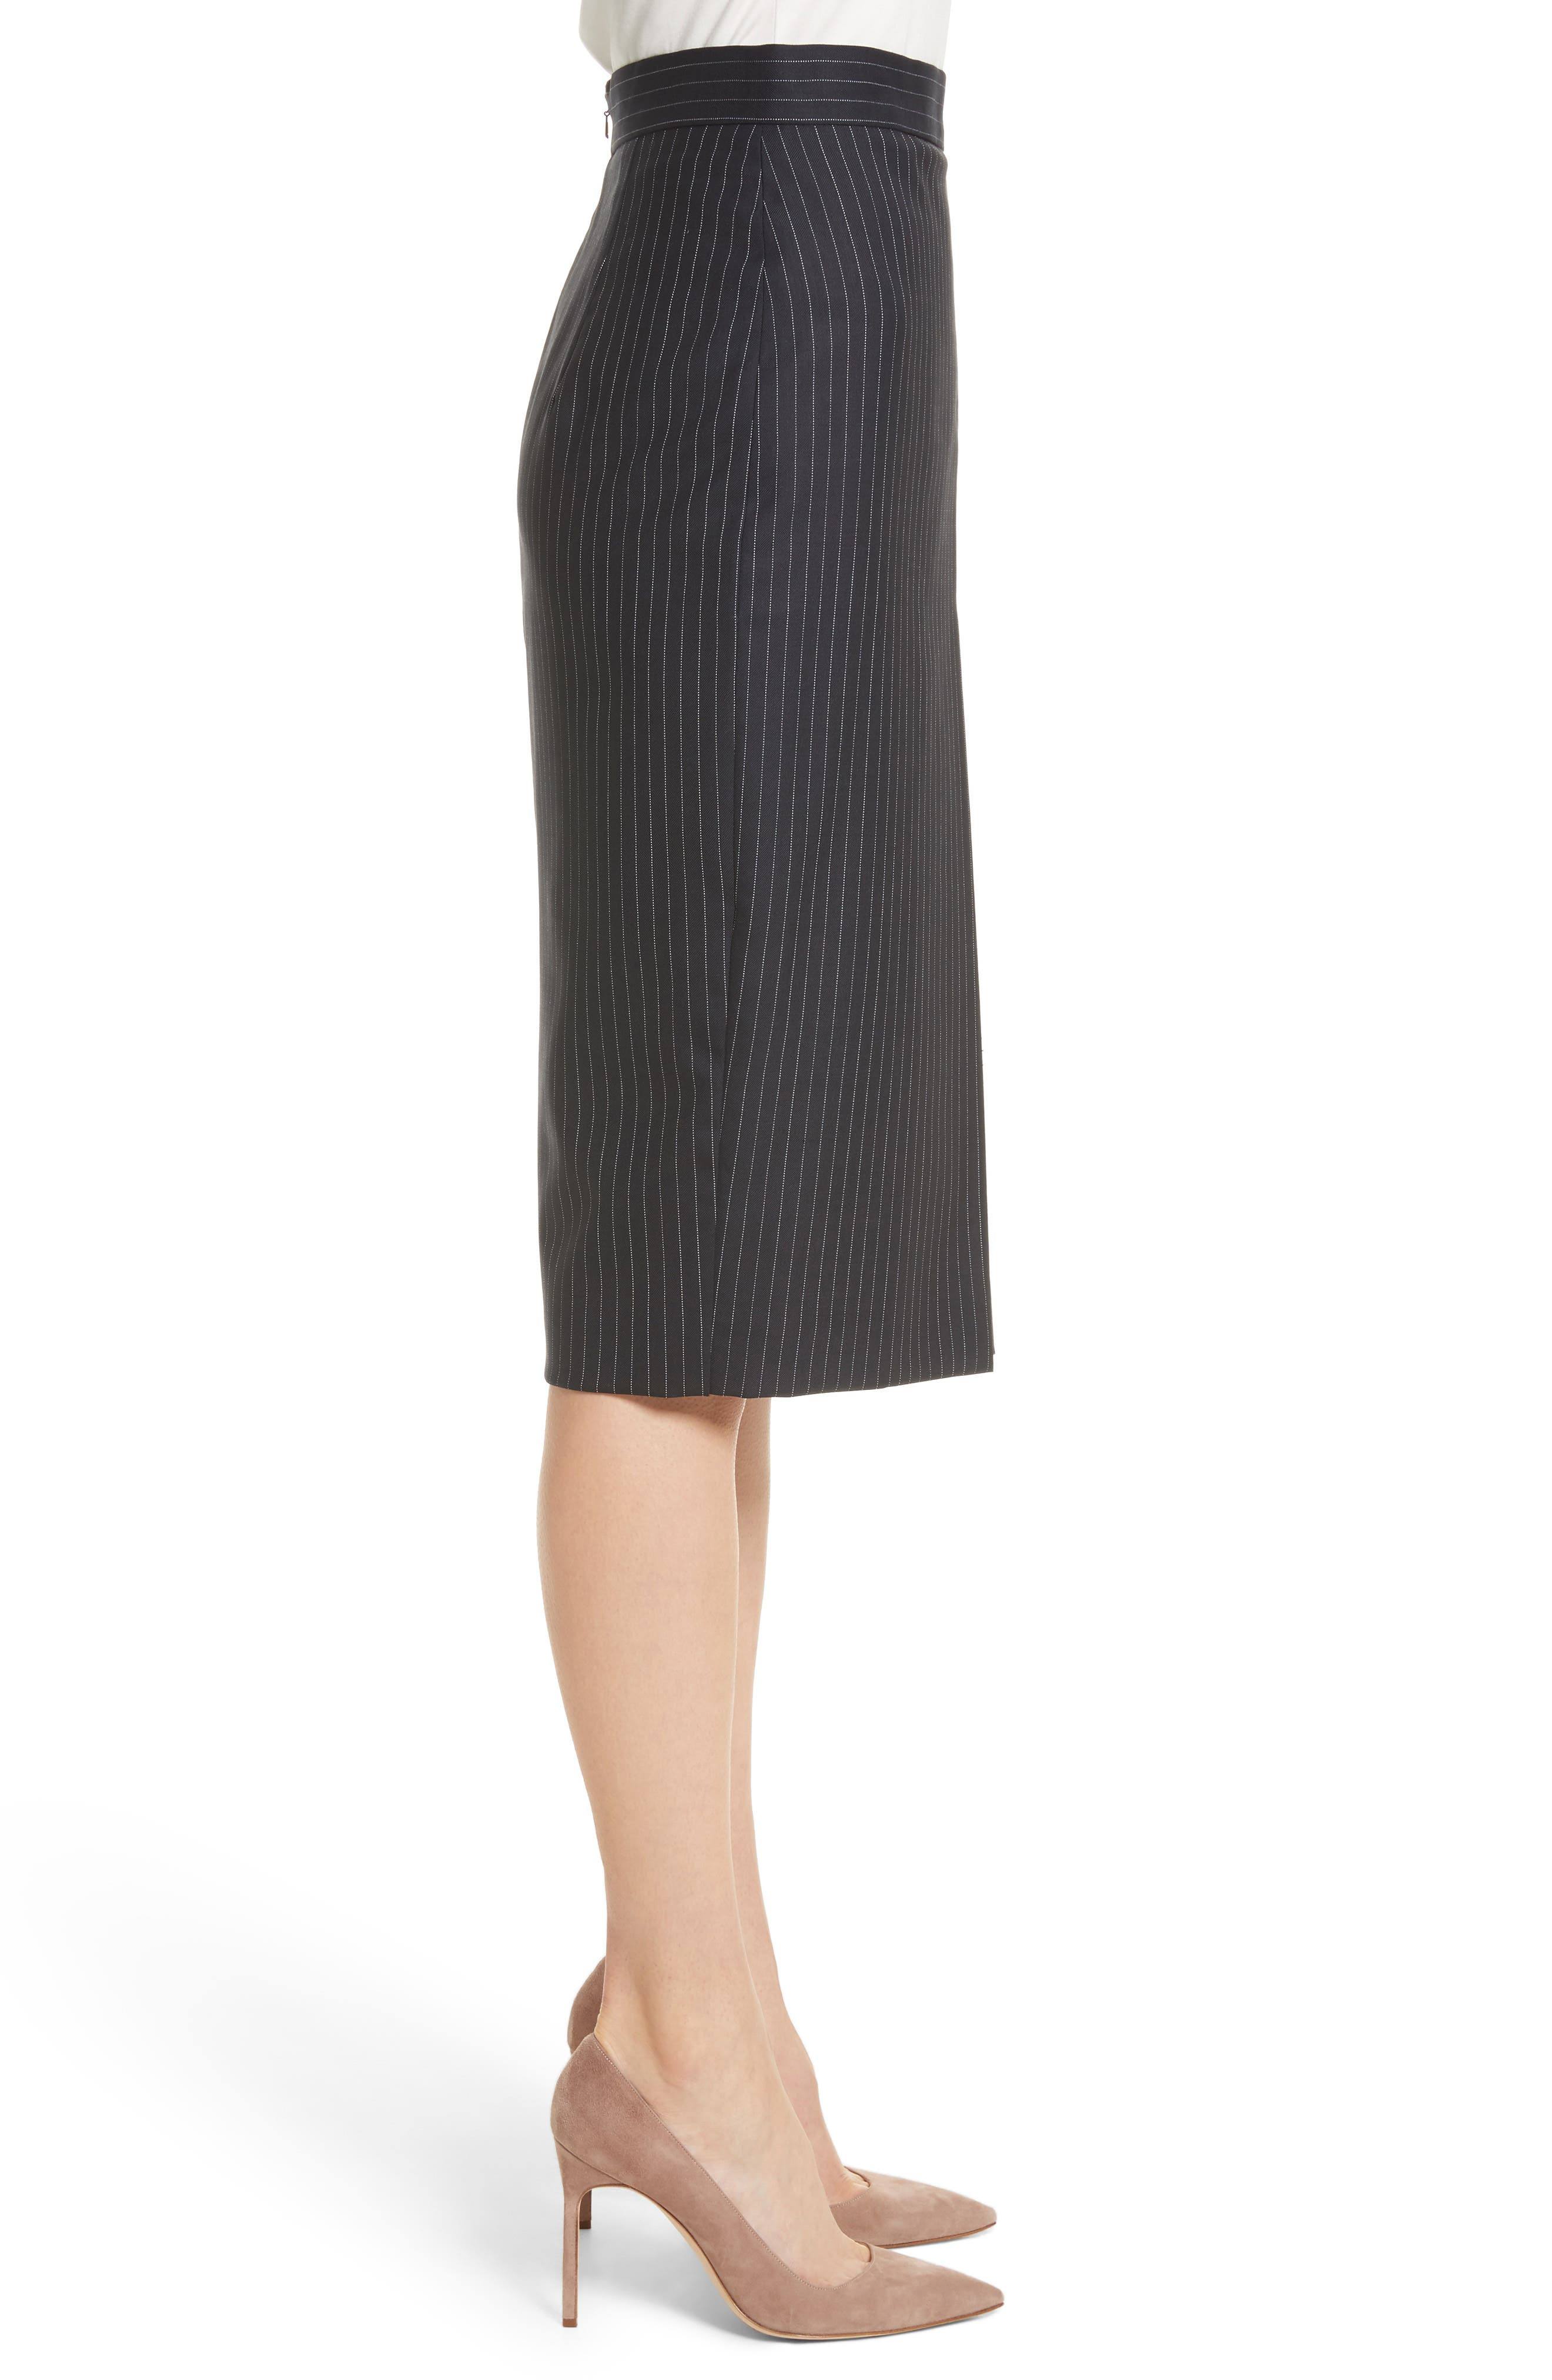 Abba Pinstripe Pencil Skirt,                             Alternate thumbnail 3, color,                             411